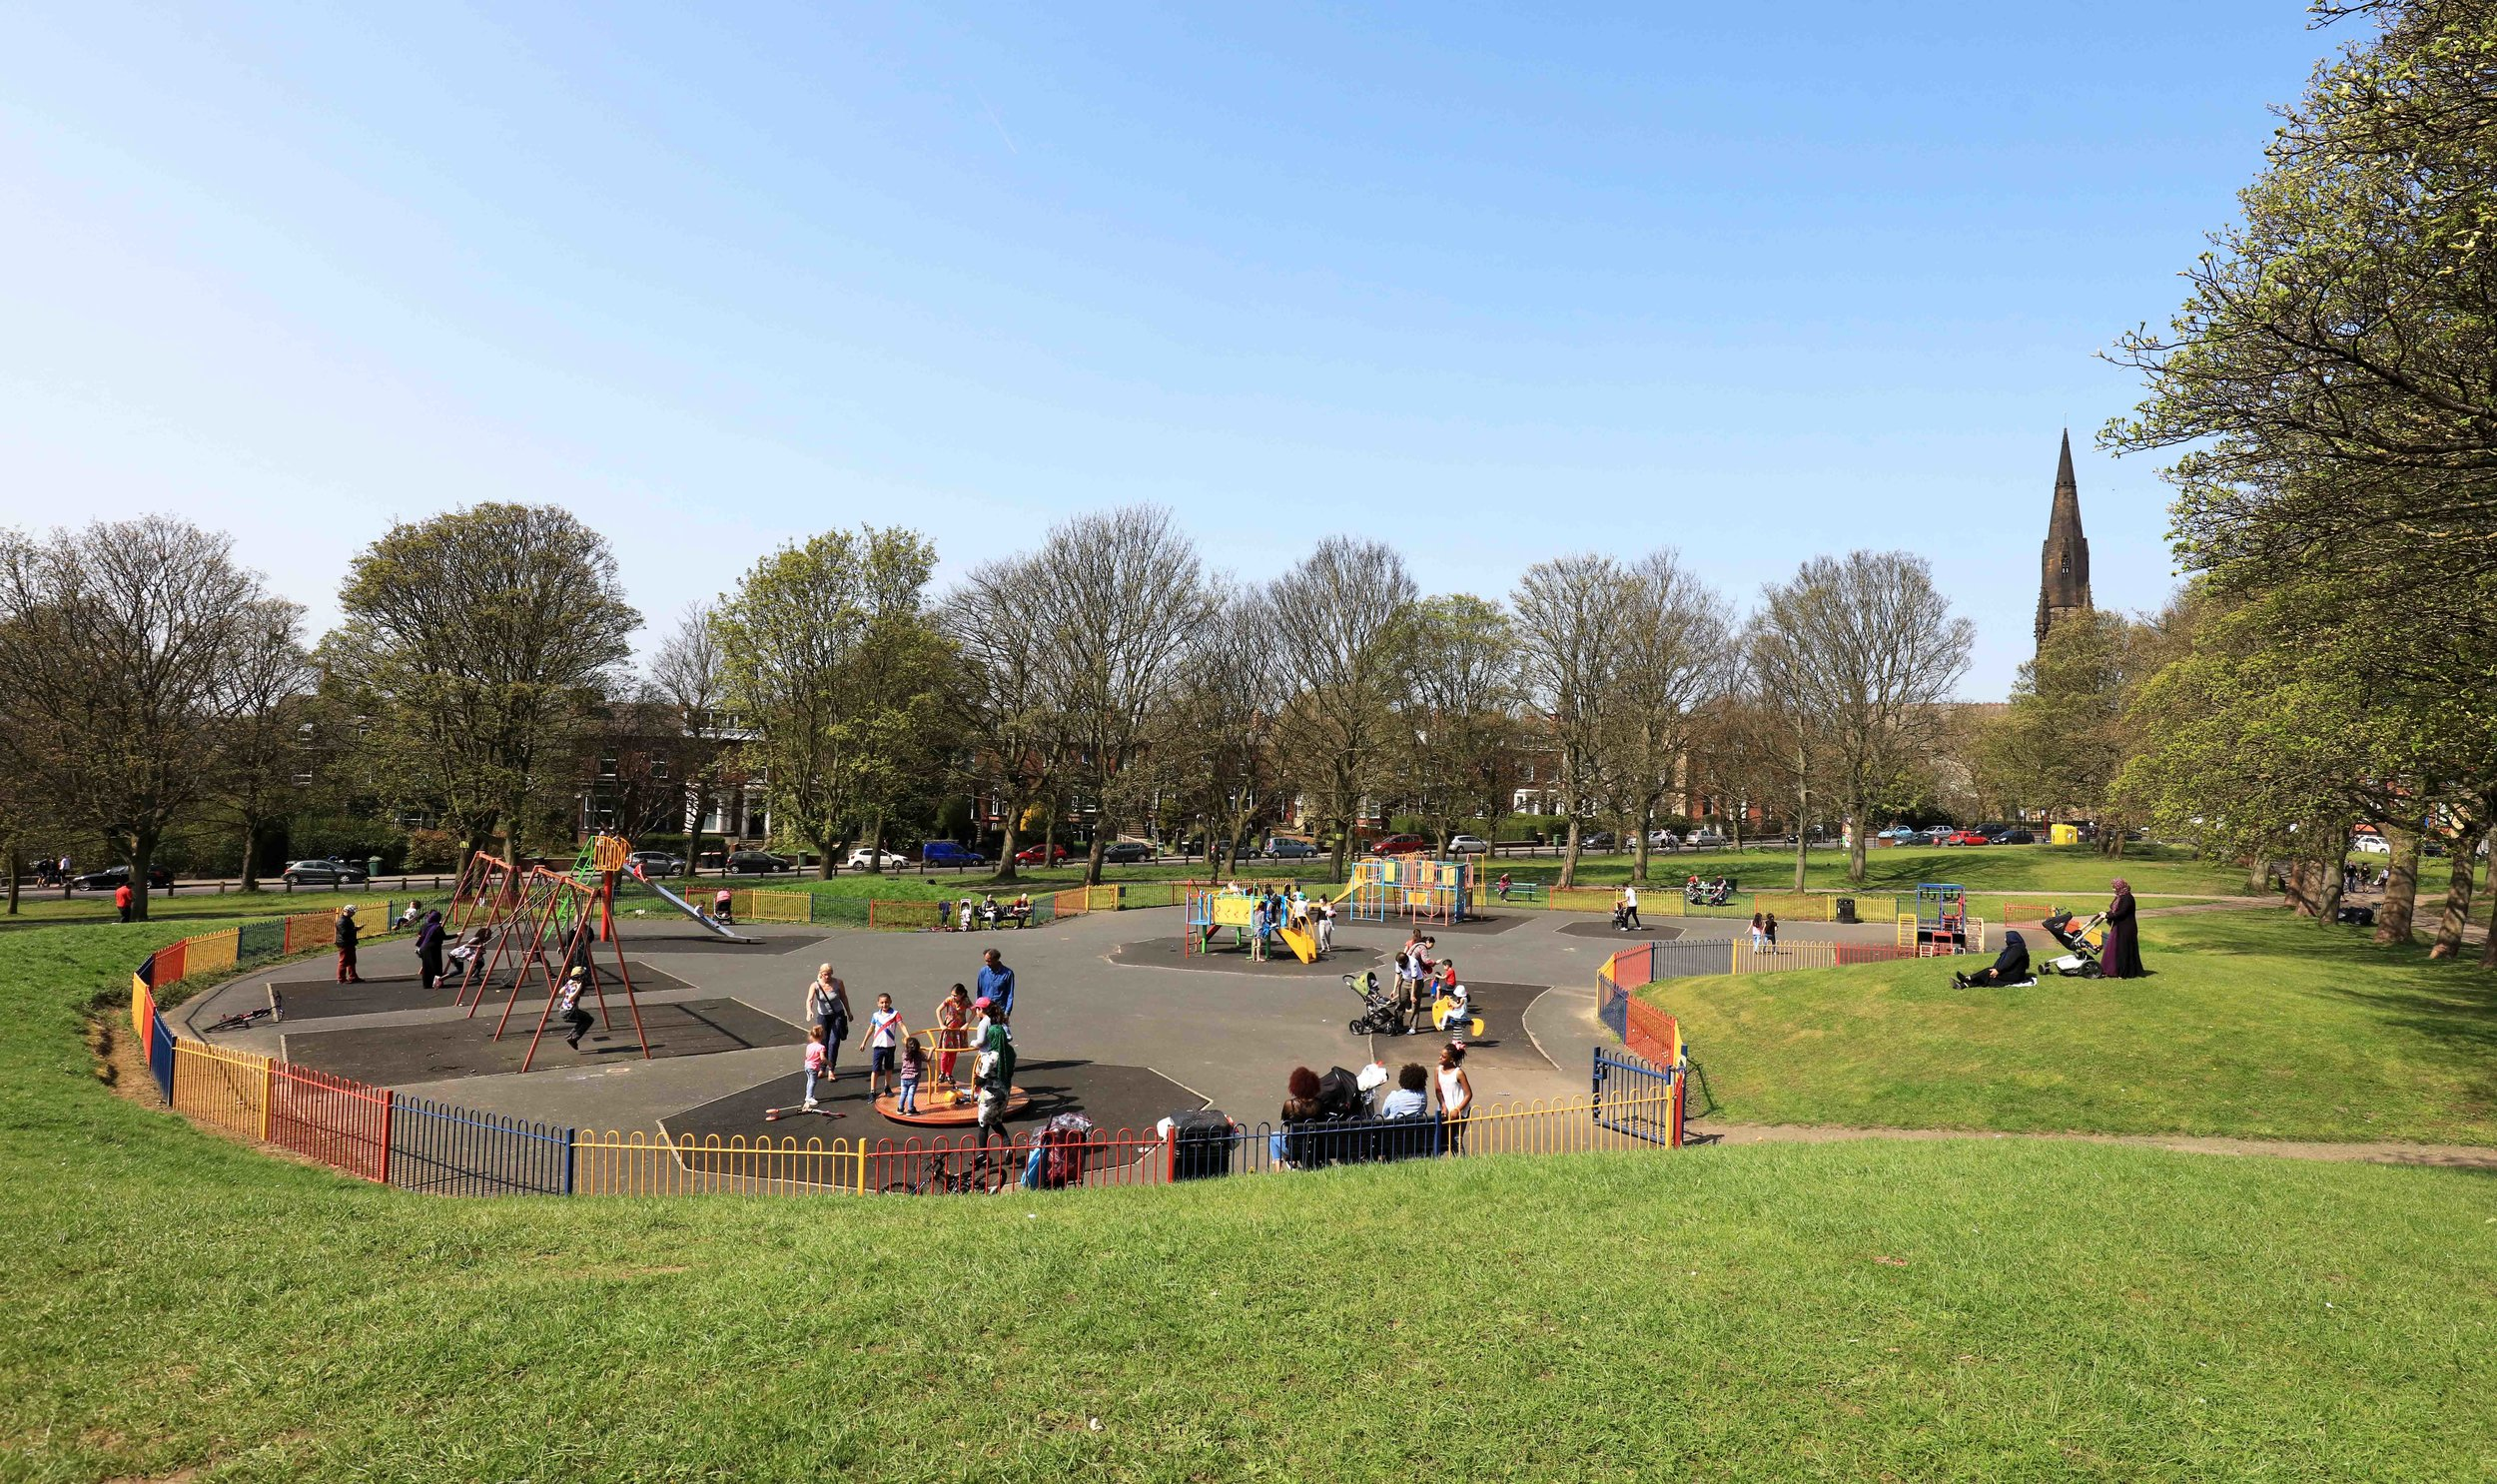 Playground, Woodhouse Moor © JHJ